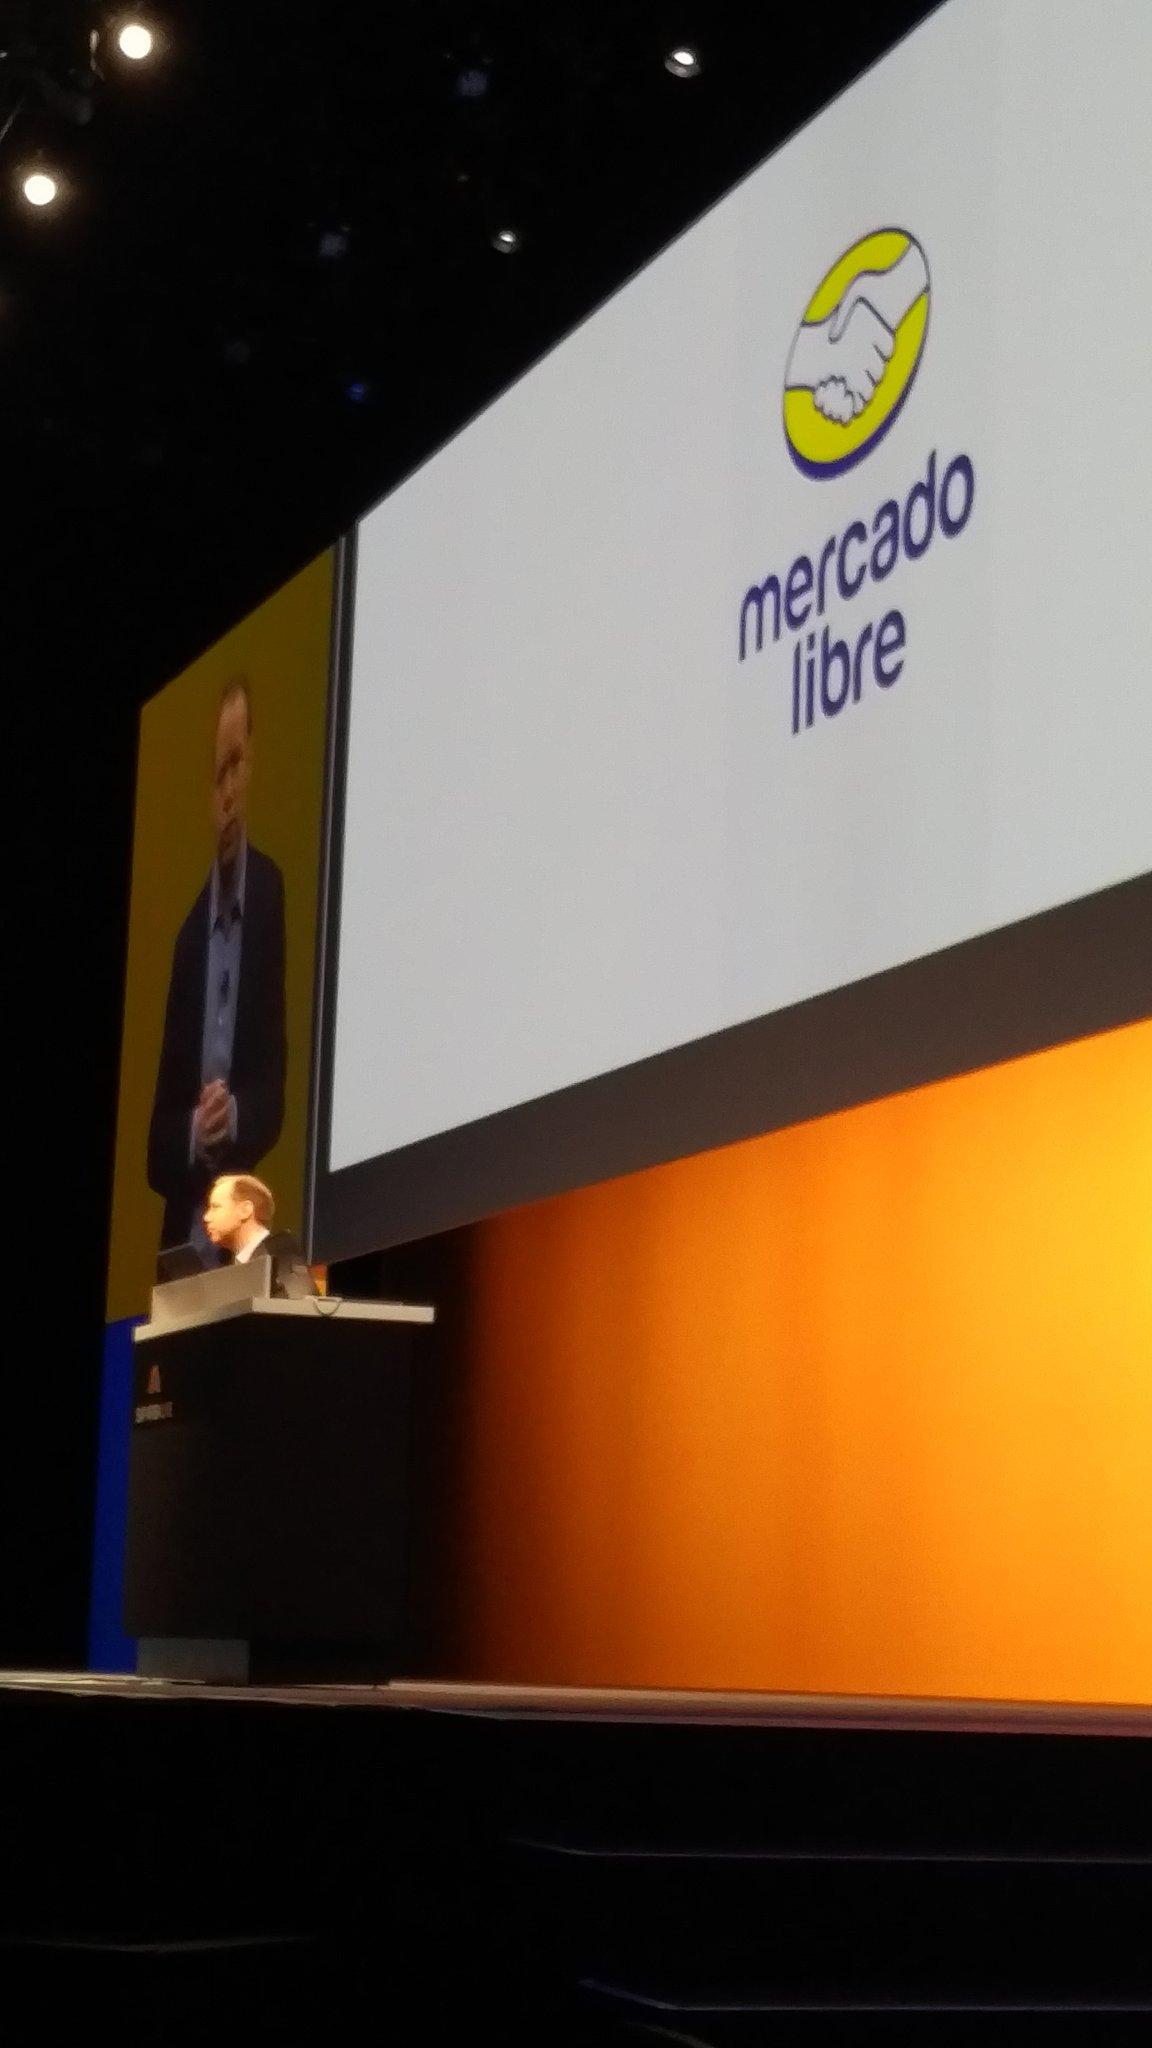 Spot buy doing wek says @Atzberger -  @Mercadolibre on the platform. #SAPARIBALIVE https://t.co/w0K5tXVXgQ